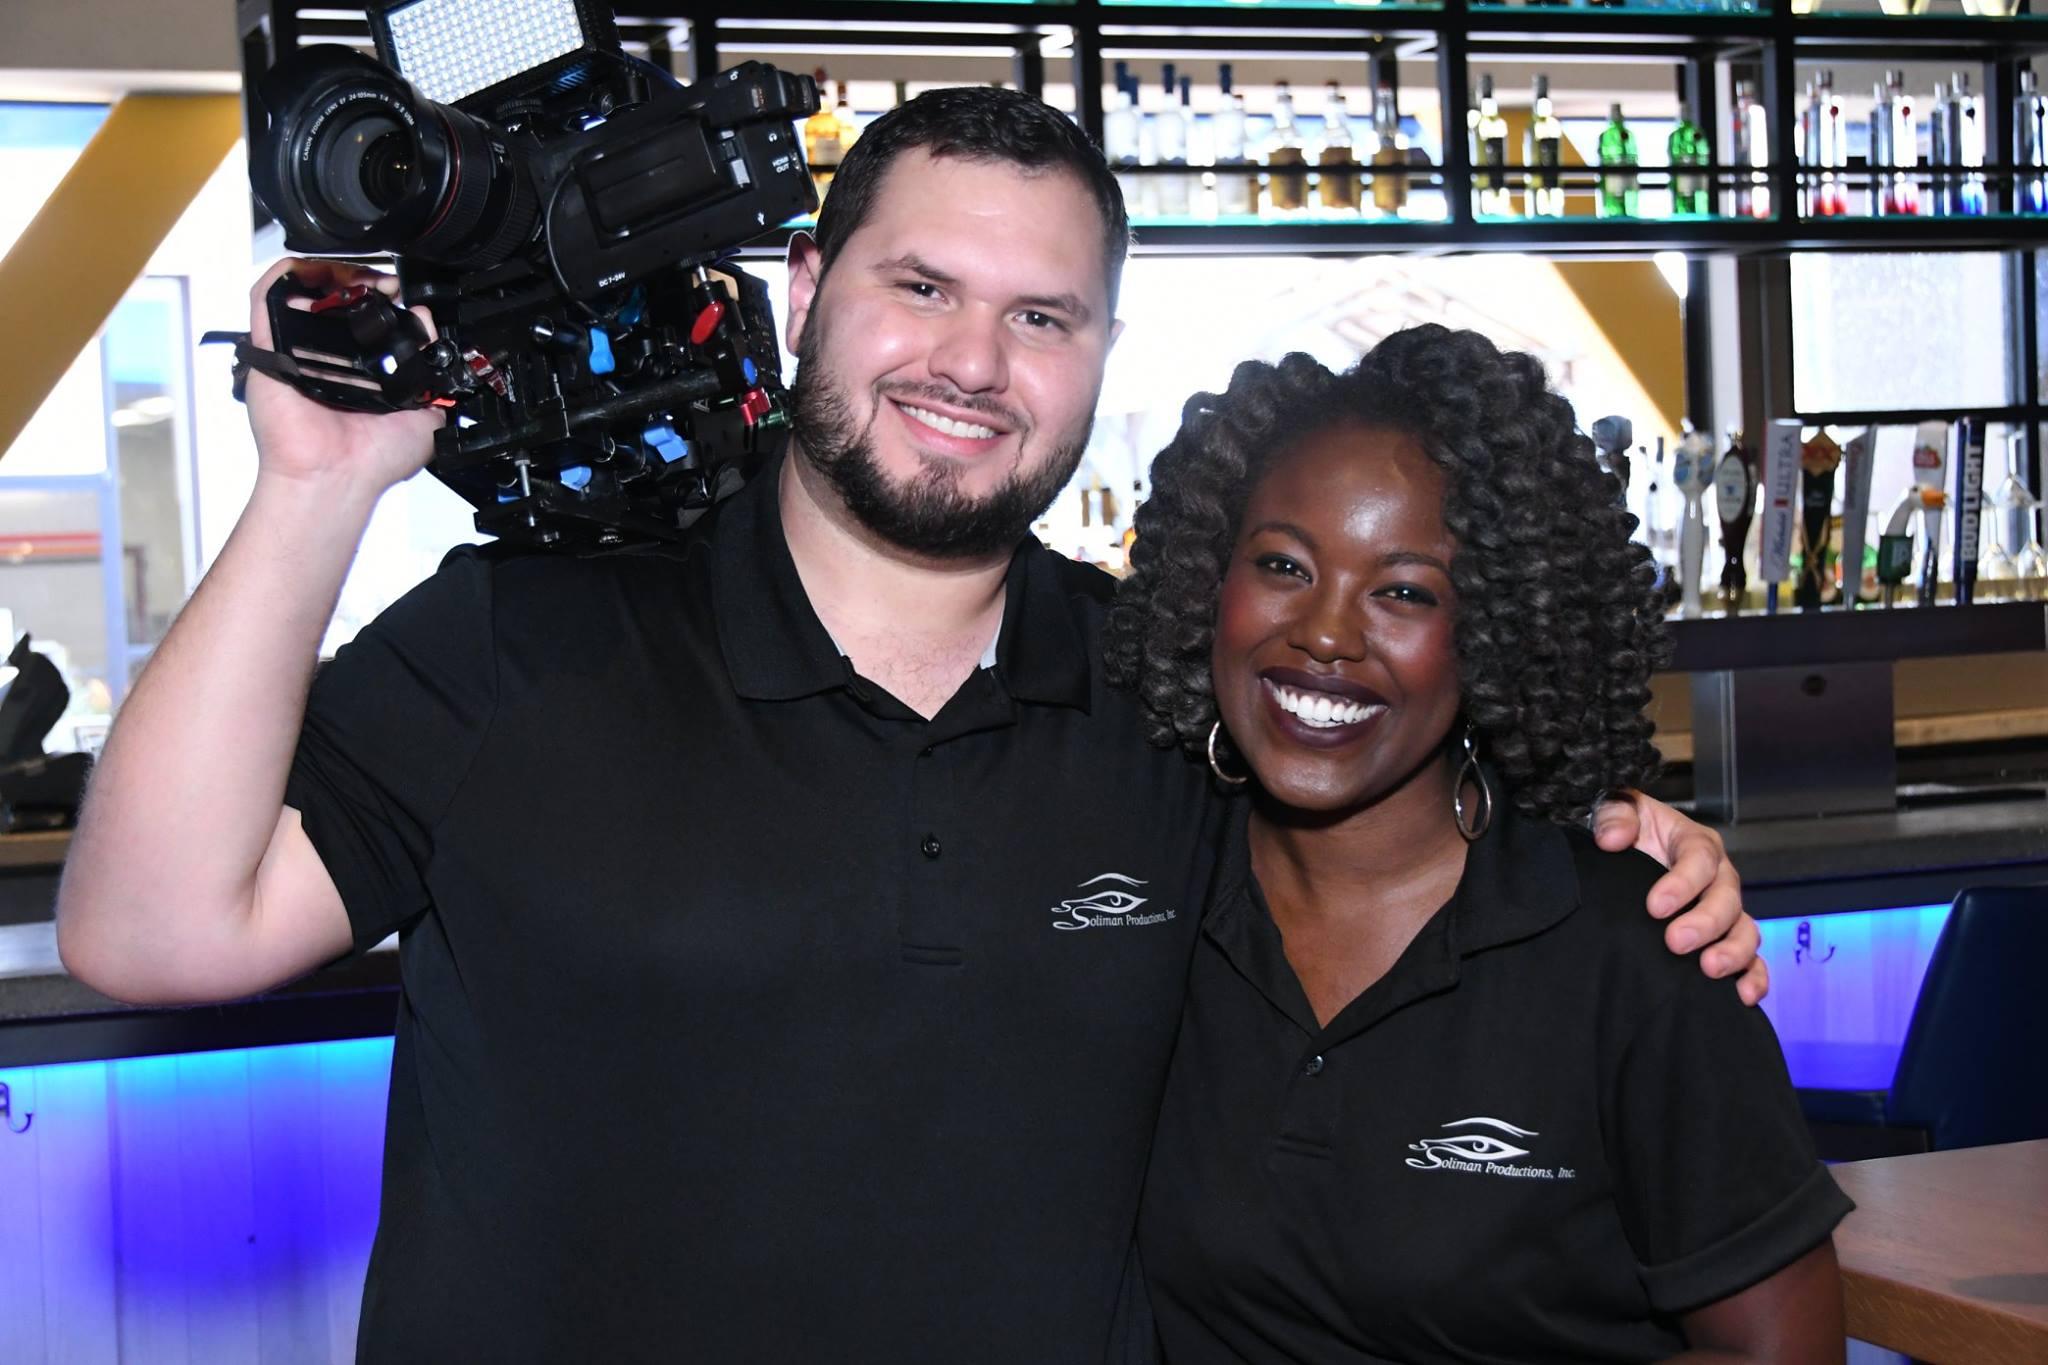 Riesa and Orlando_MPI Orlando Fall Fusion 2018.jpg